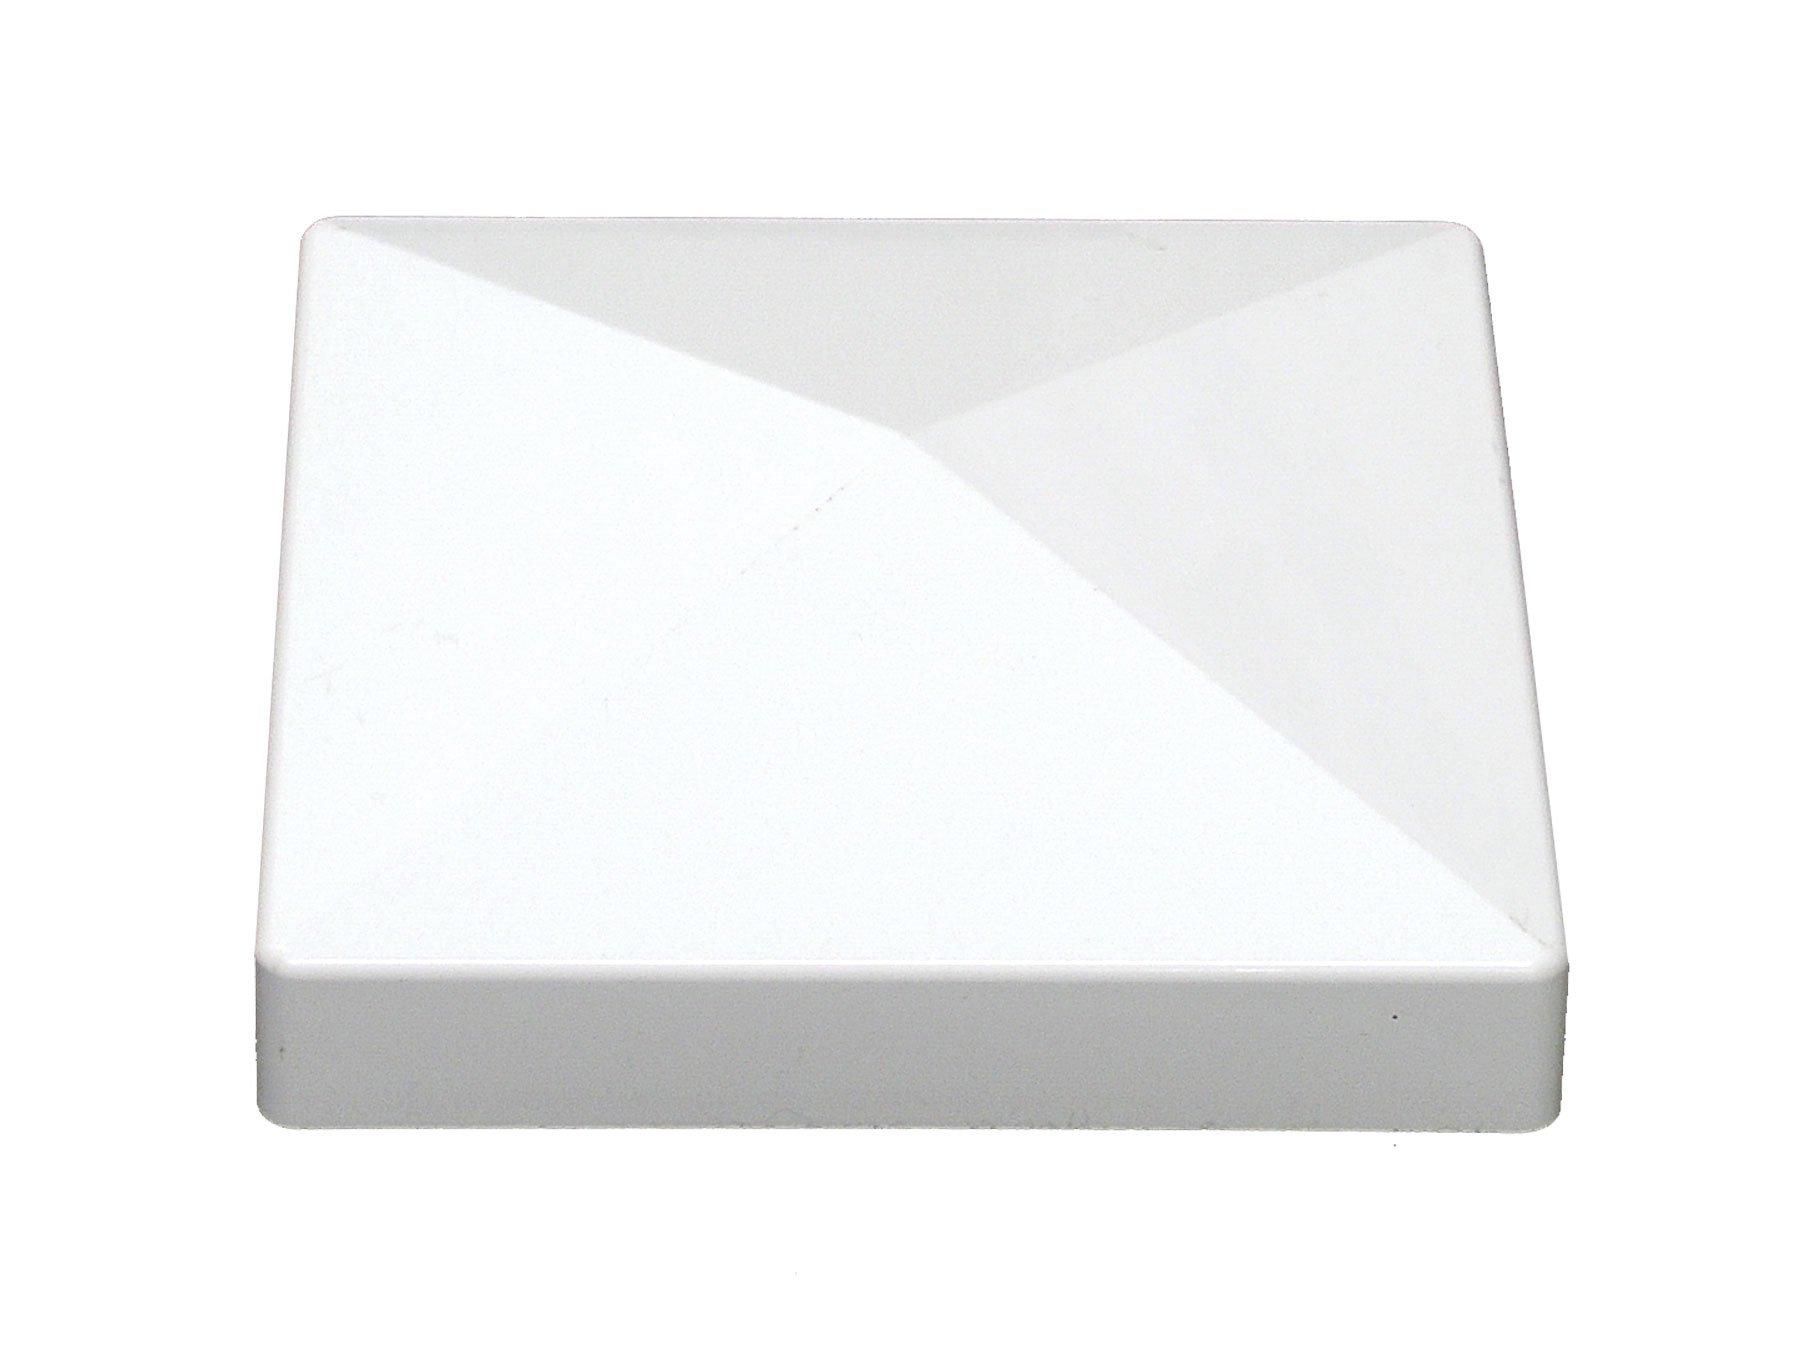 Premium White 6x6(5 5/8'' x 5 5/8'') Pyramid Fence Post Caps (Pack of 10)